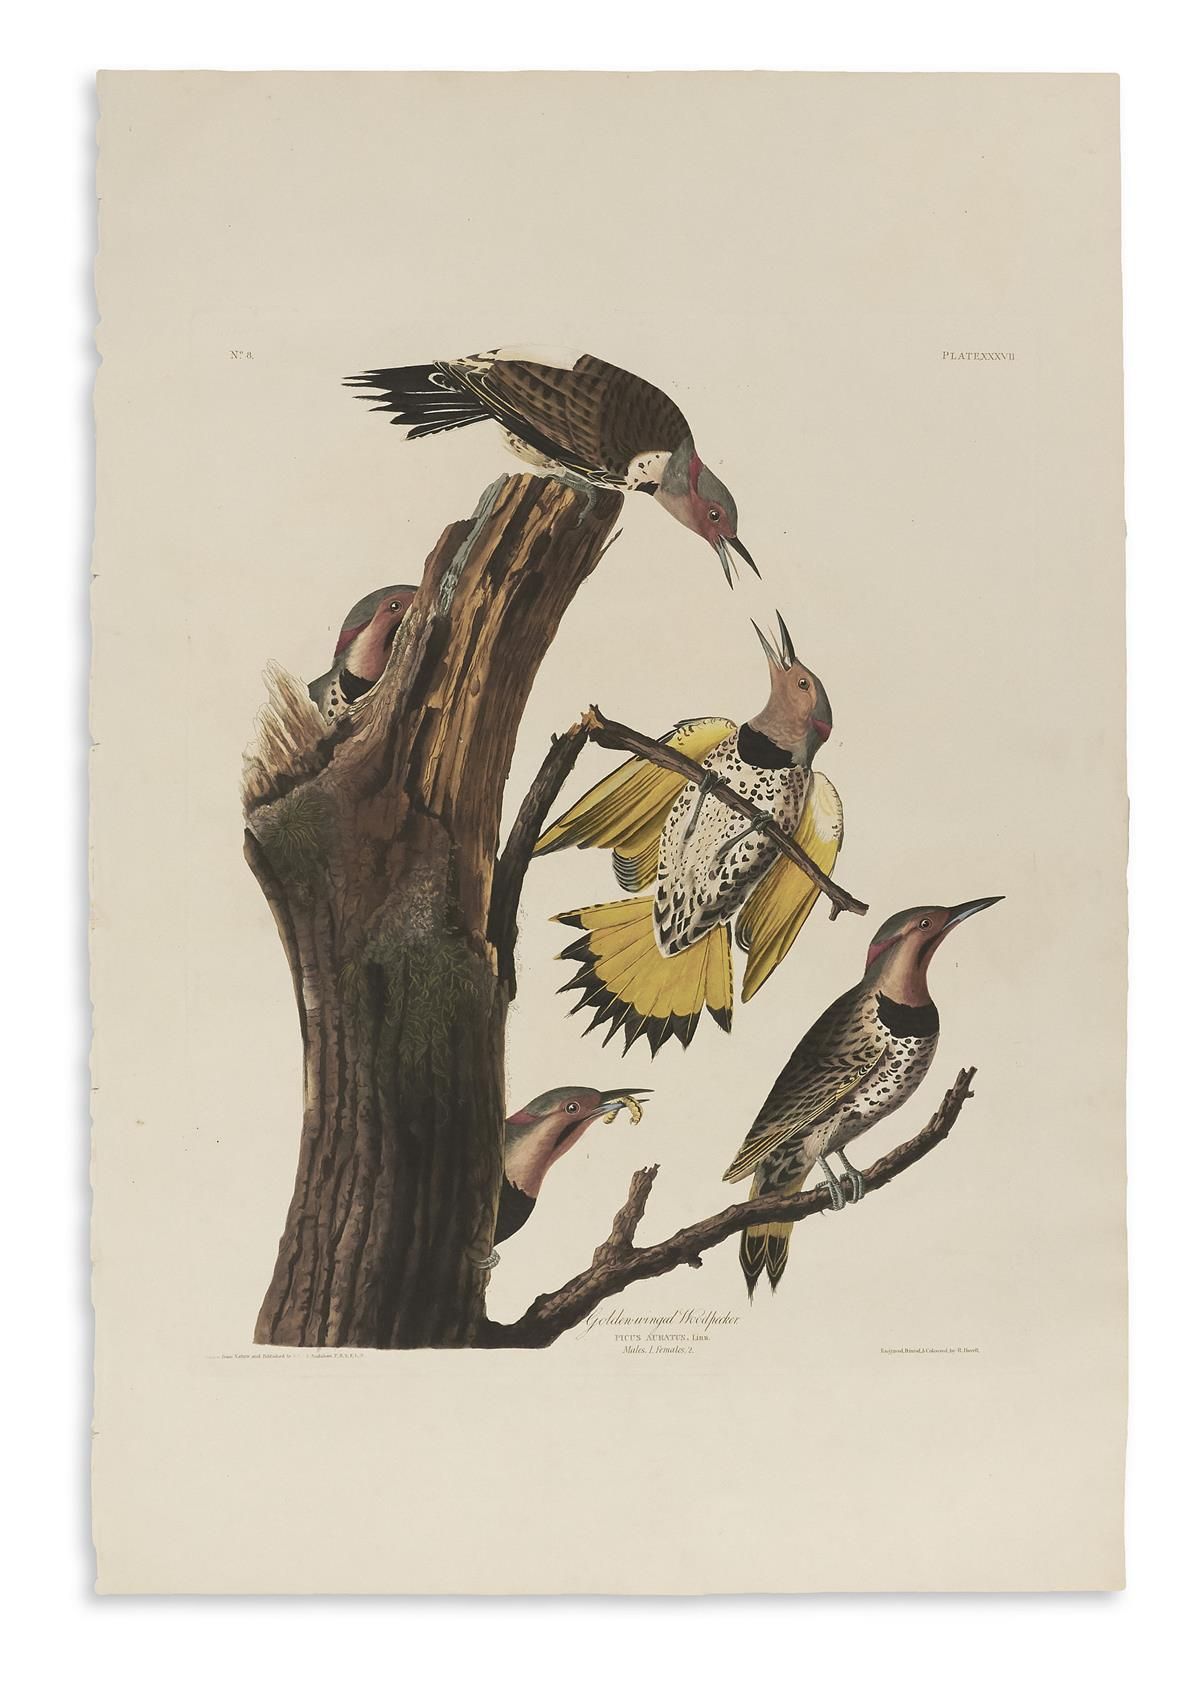 AUDUBON-JOHN-JAMES-Golden-Winged-Woodpecker-Plate-XXXVII